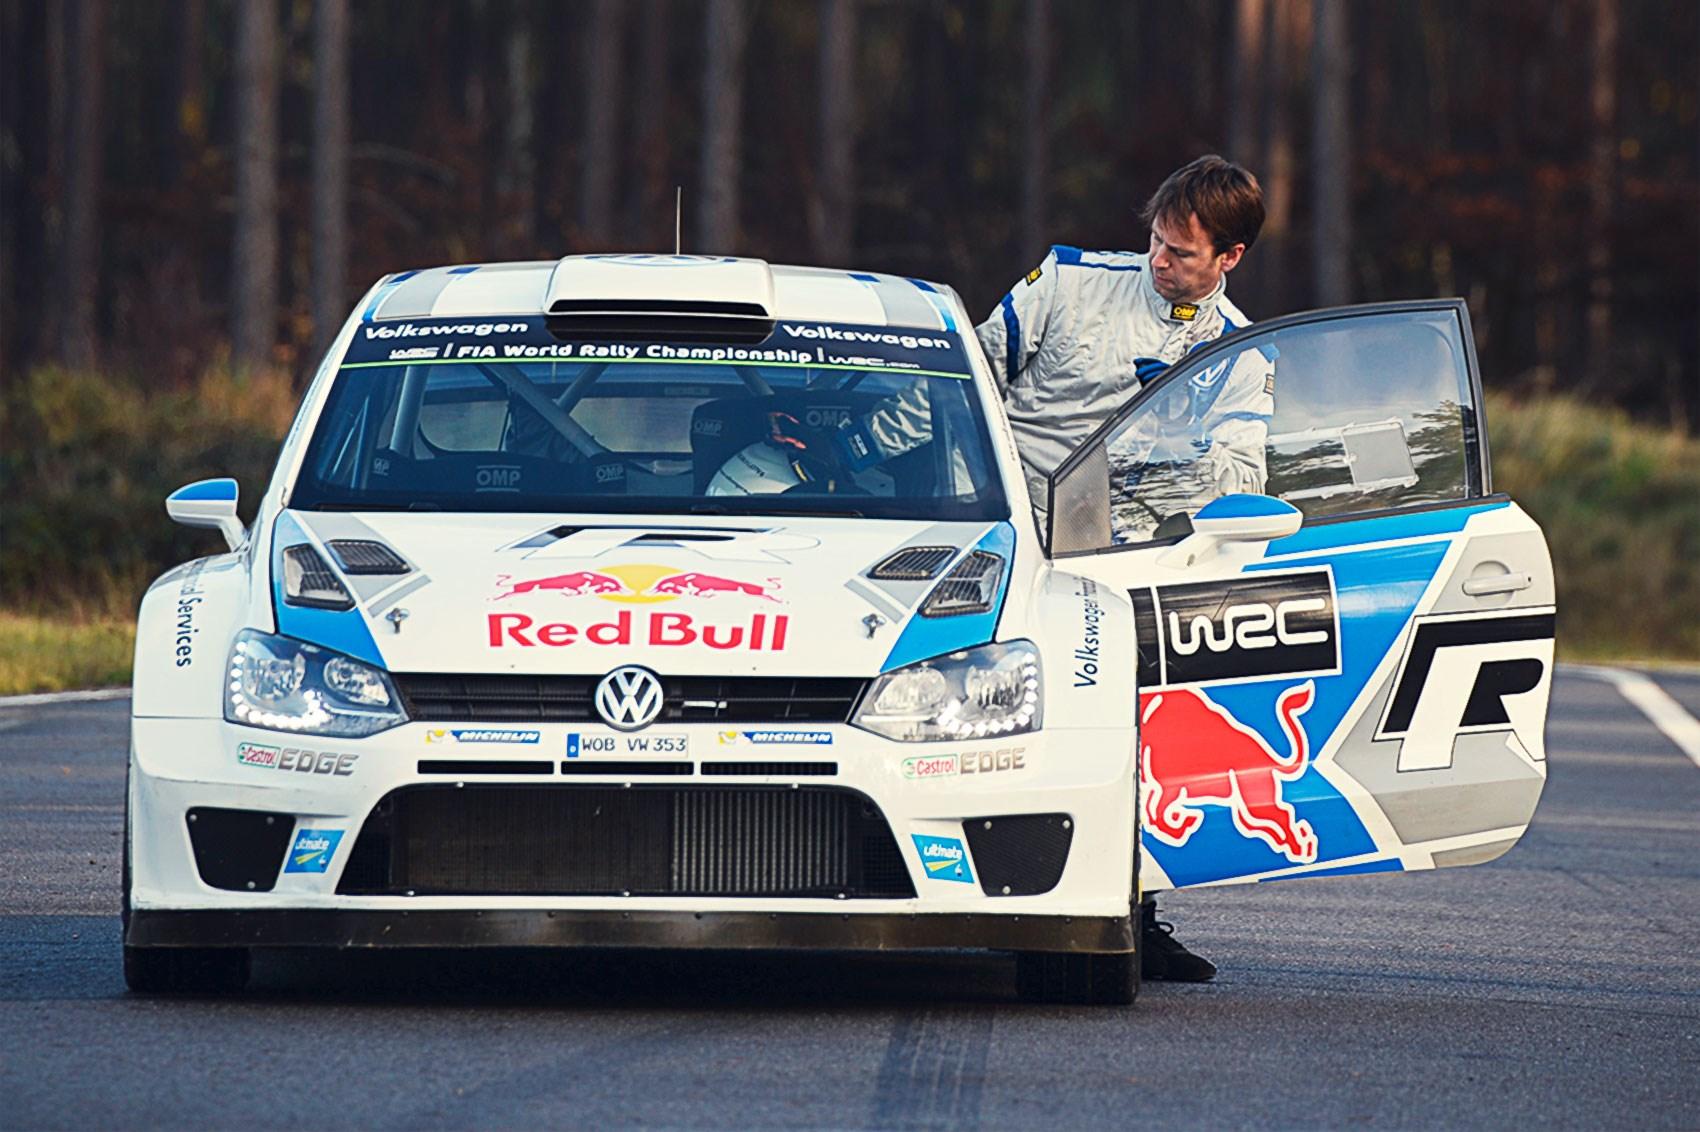 Car s ben barry swaps lives with sebastien ogier for four laps at least